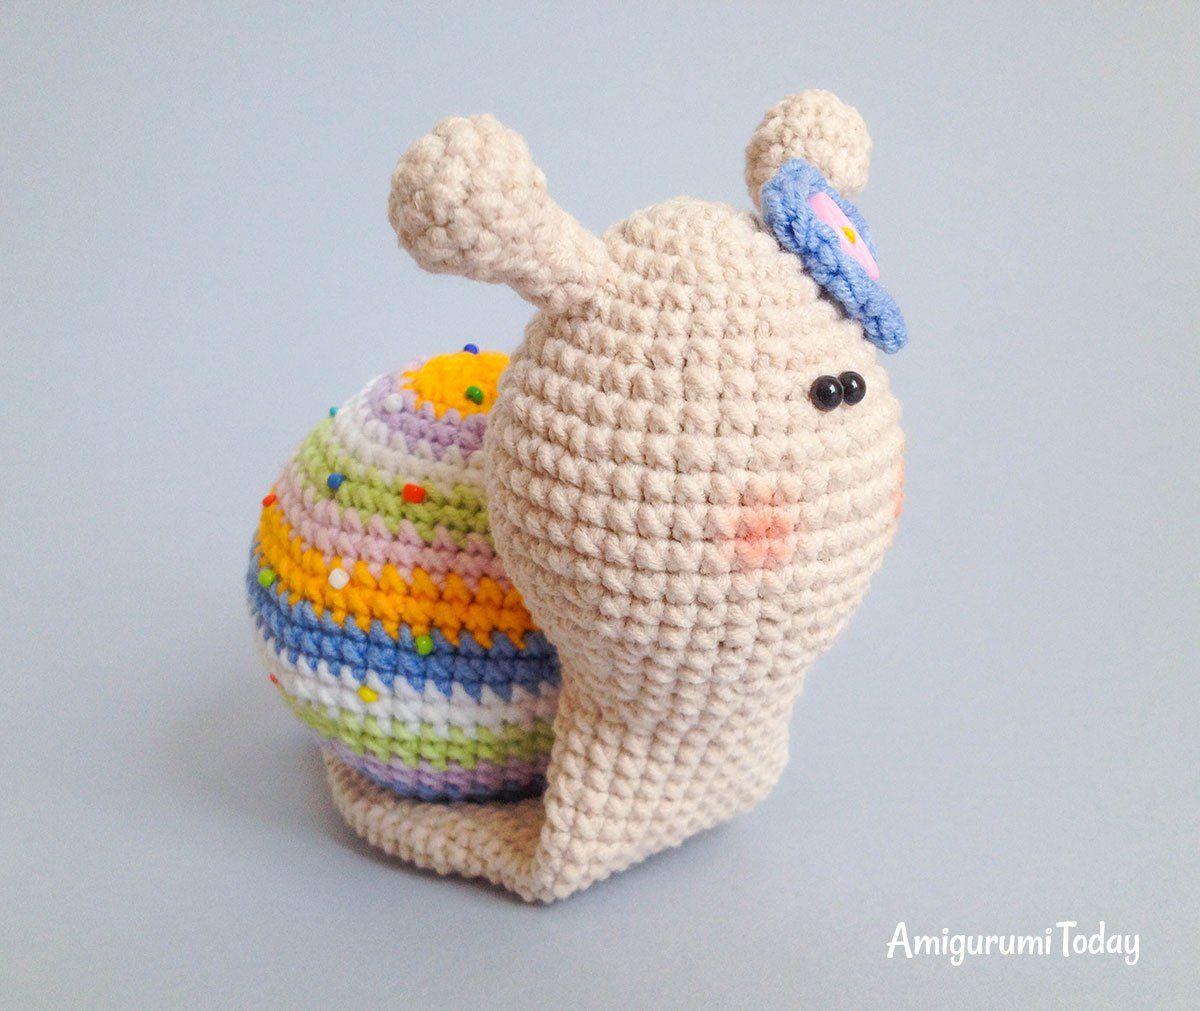 Free lady snail amigurumi pattern | amigurumis | Pinterest ...